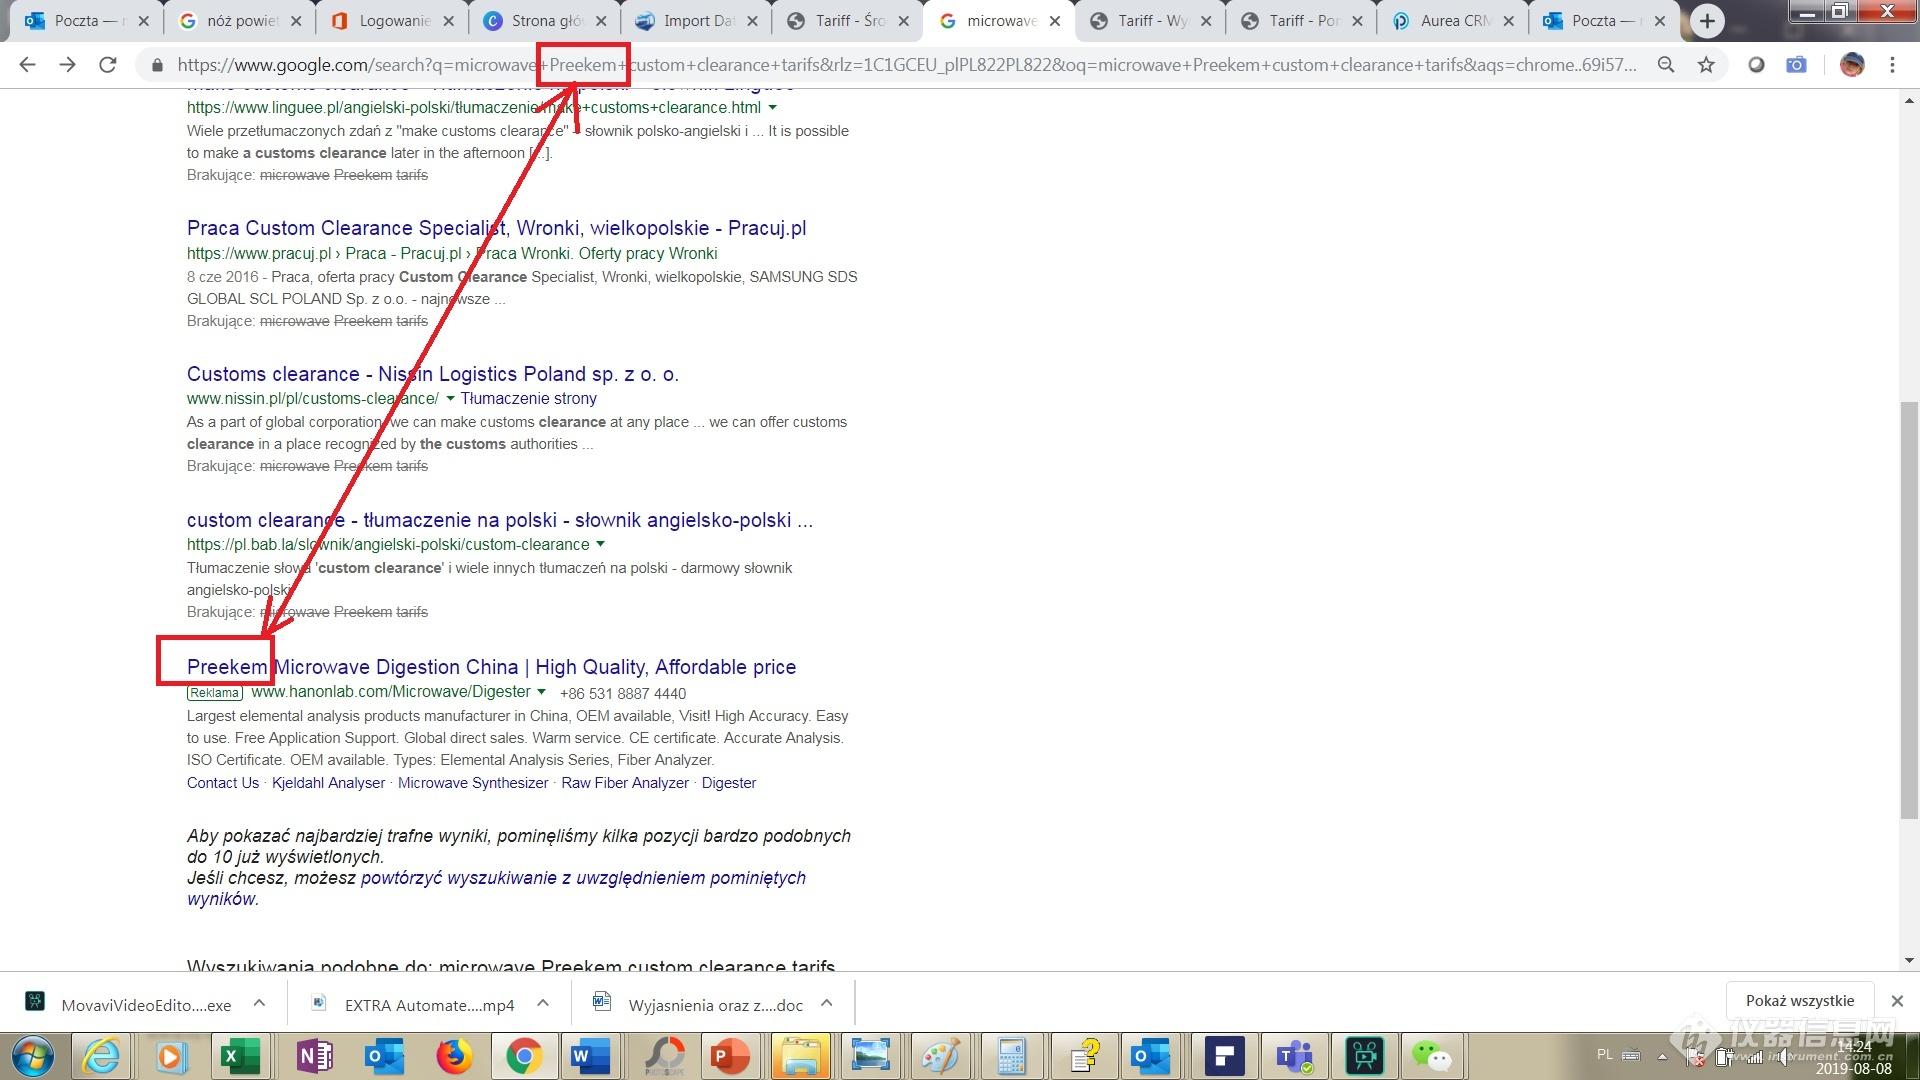 google搜索截图-1-11.png